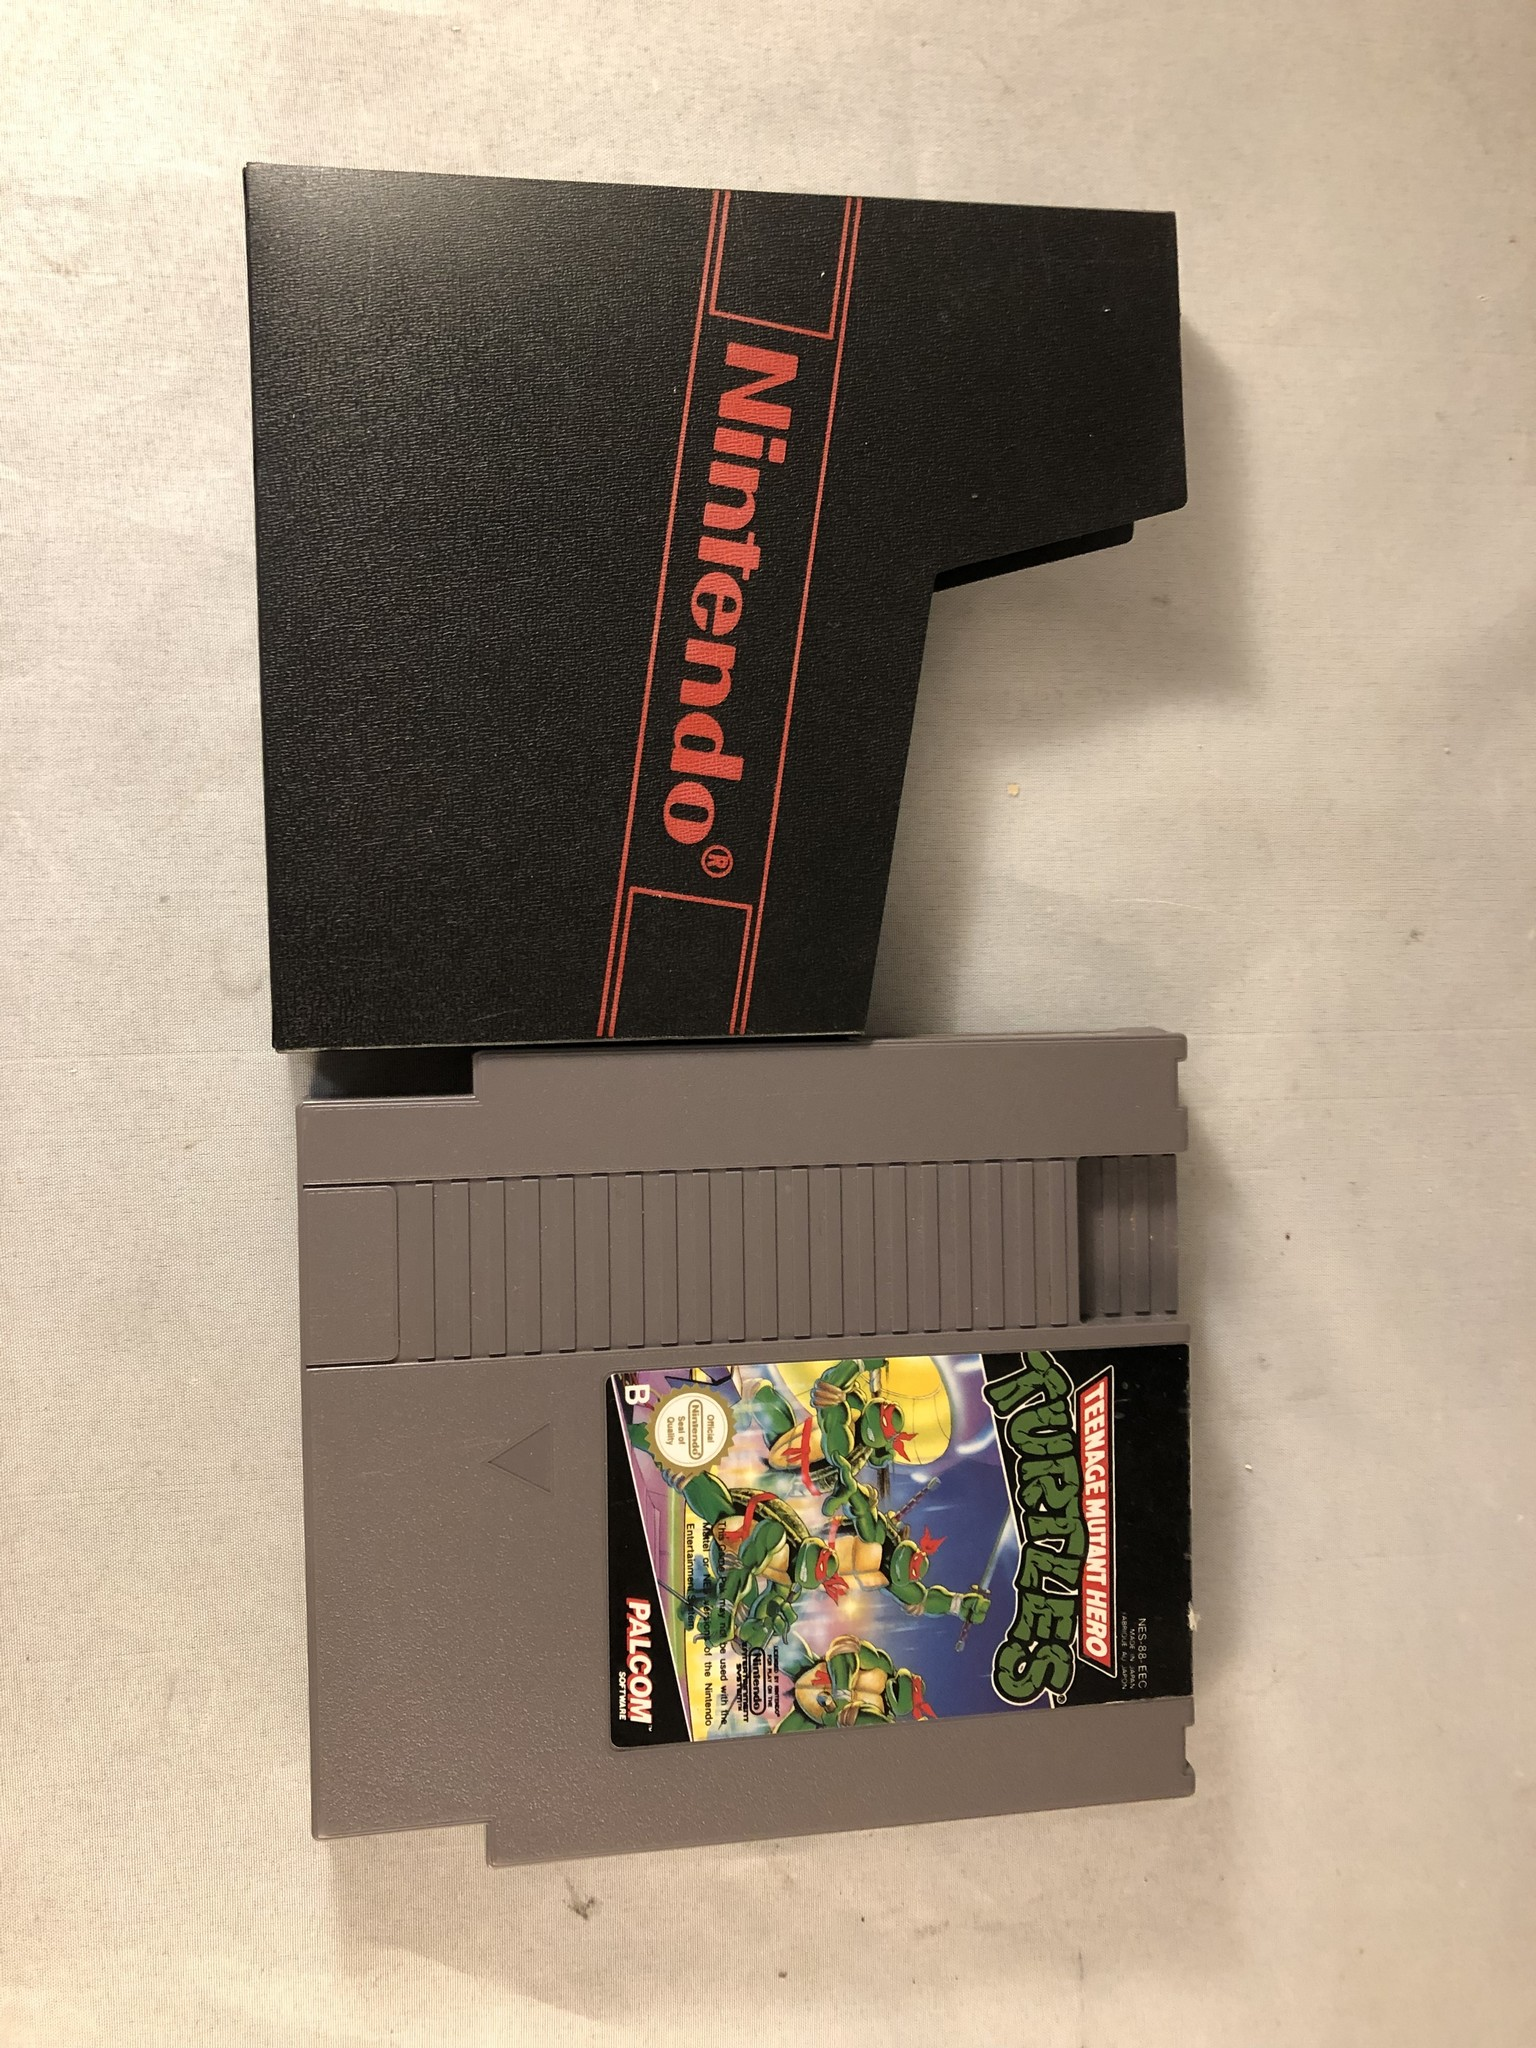 Nintendo NES Teenage mutant hero turtles